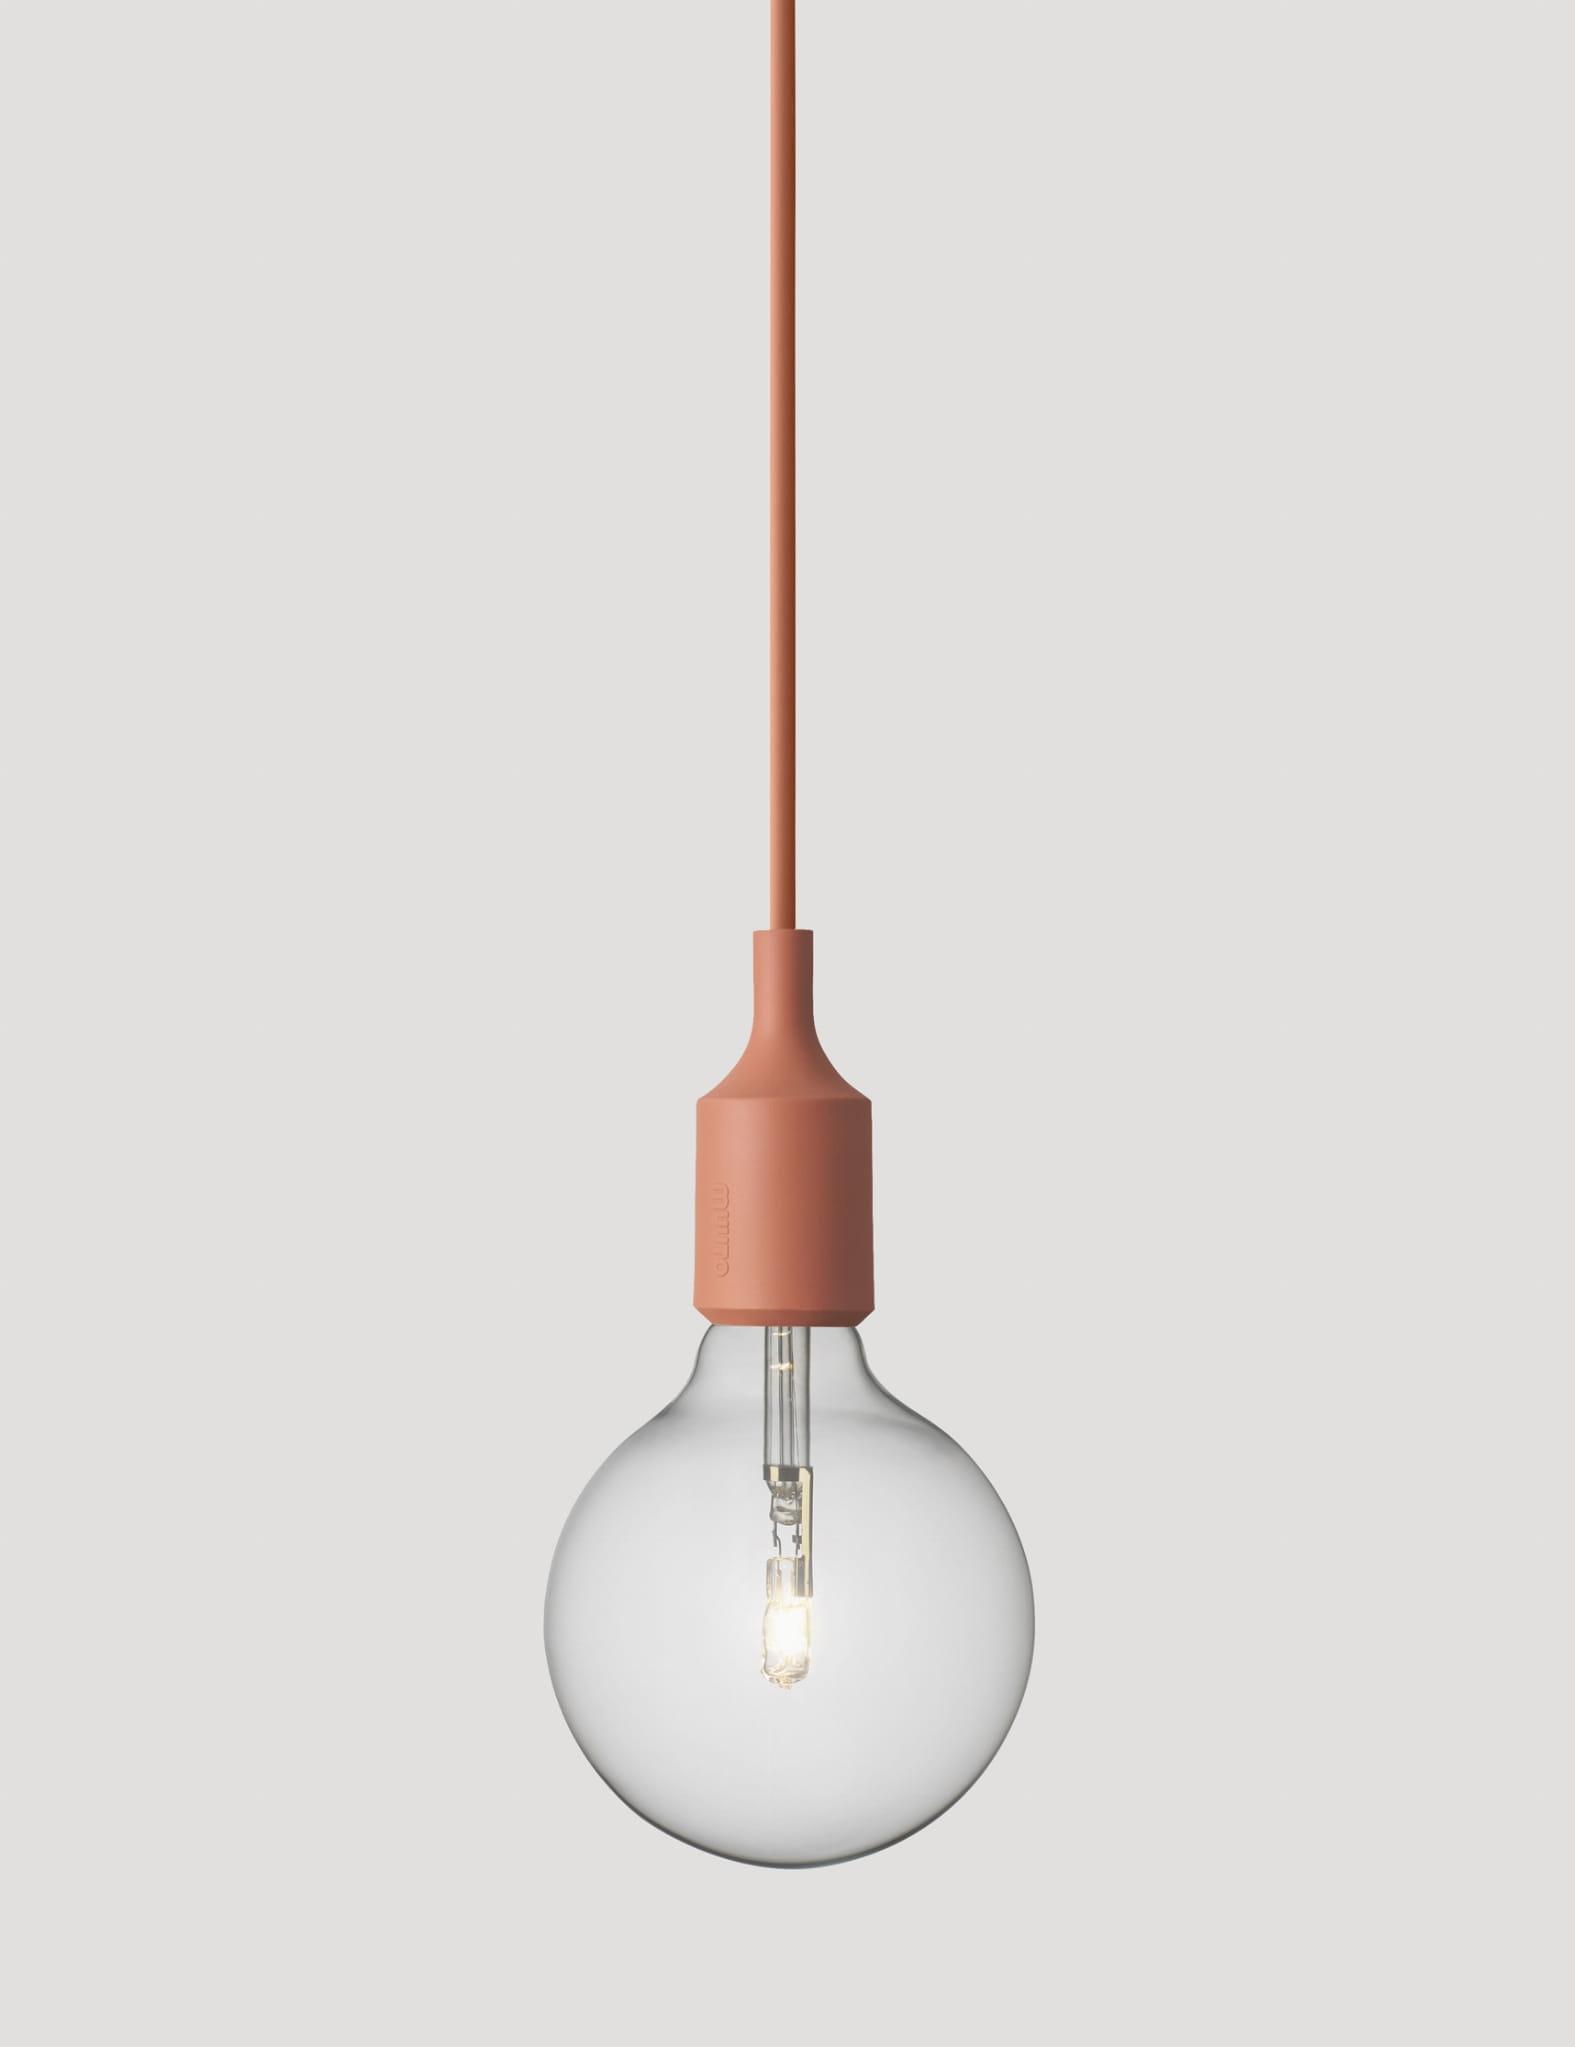 Bra MUUTO lampa wisząca E27 SOCKET LAMP terakota AnOther DESIGN DT-64